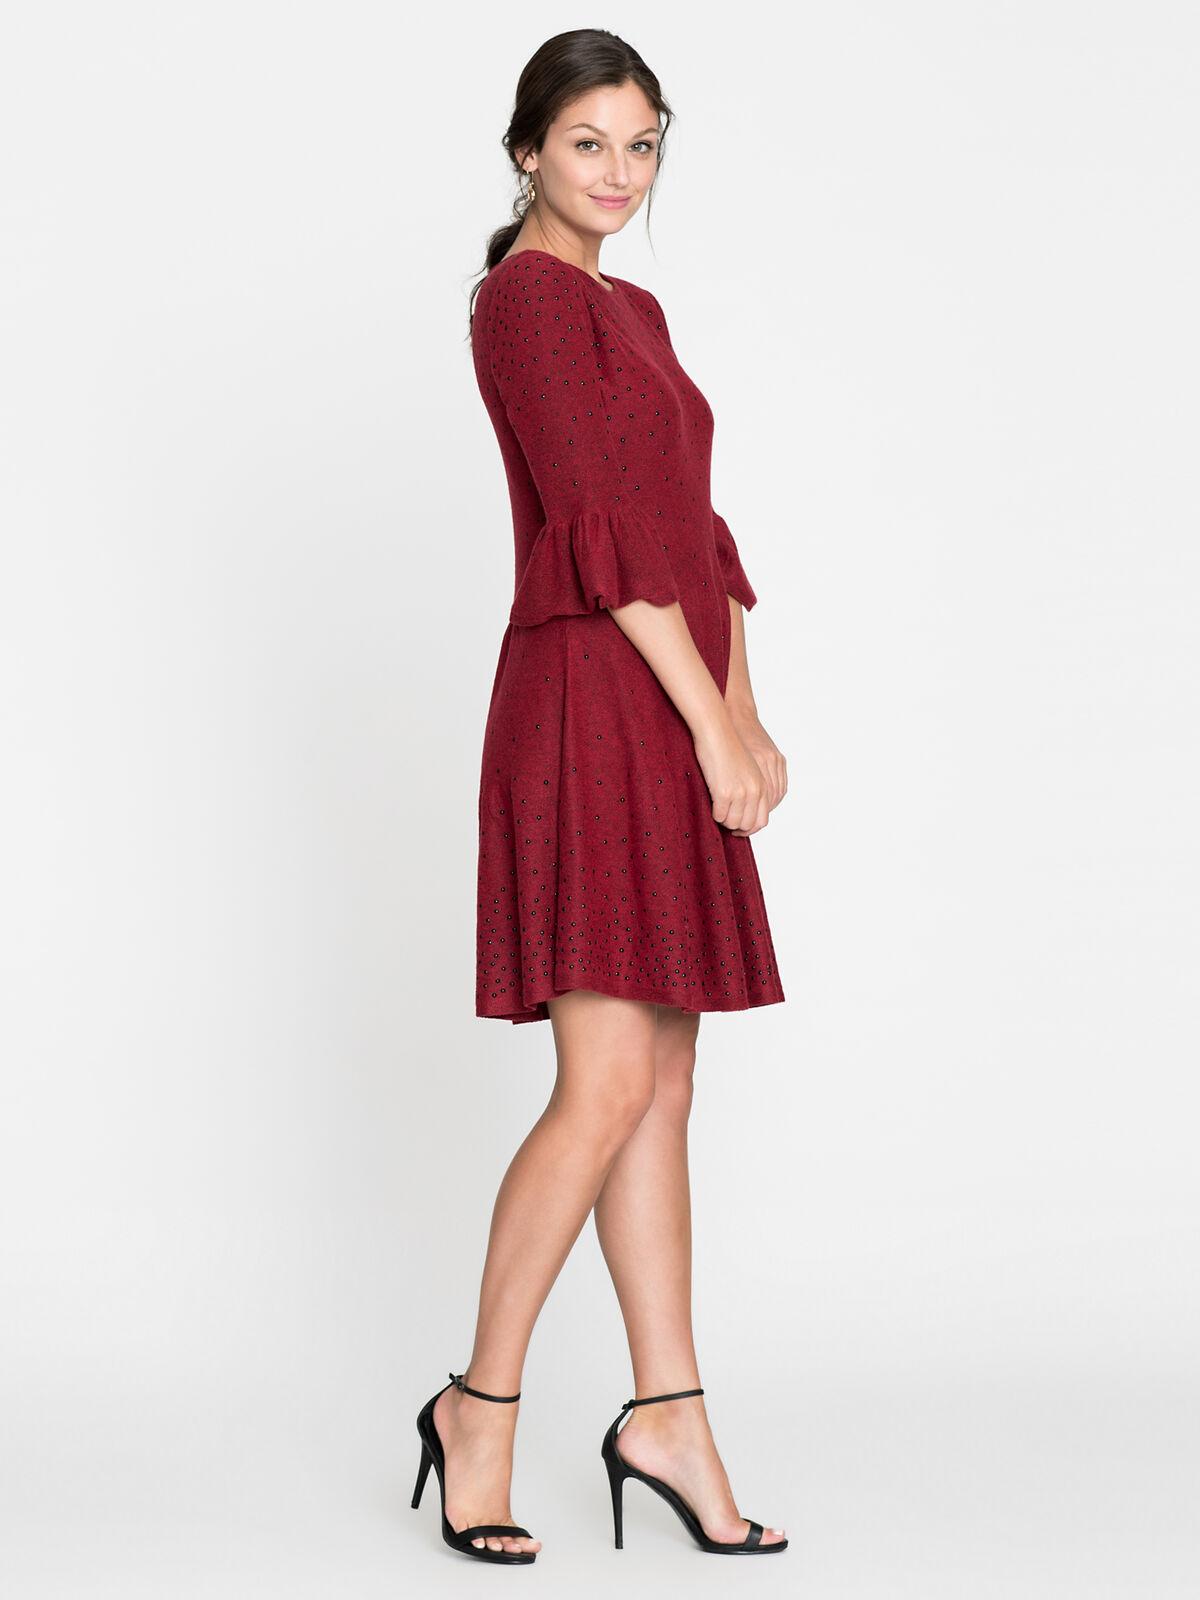 Celestial Stud Dress